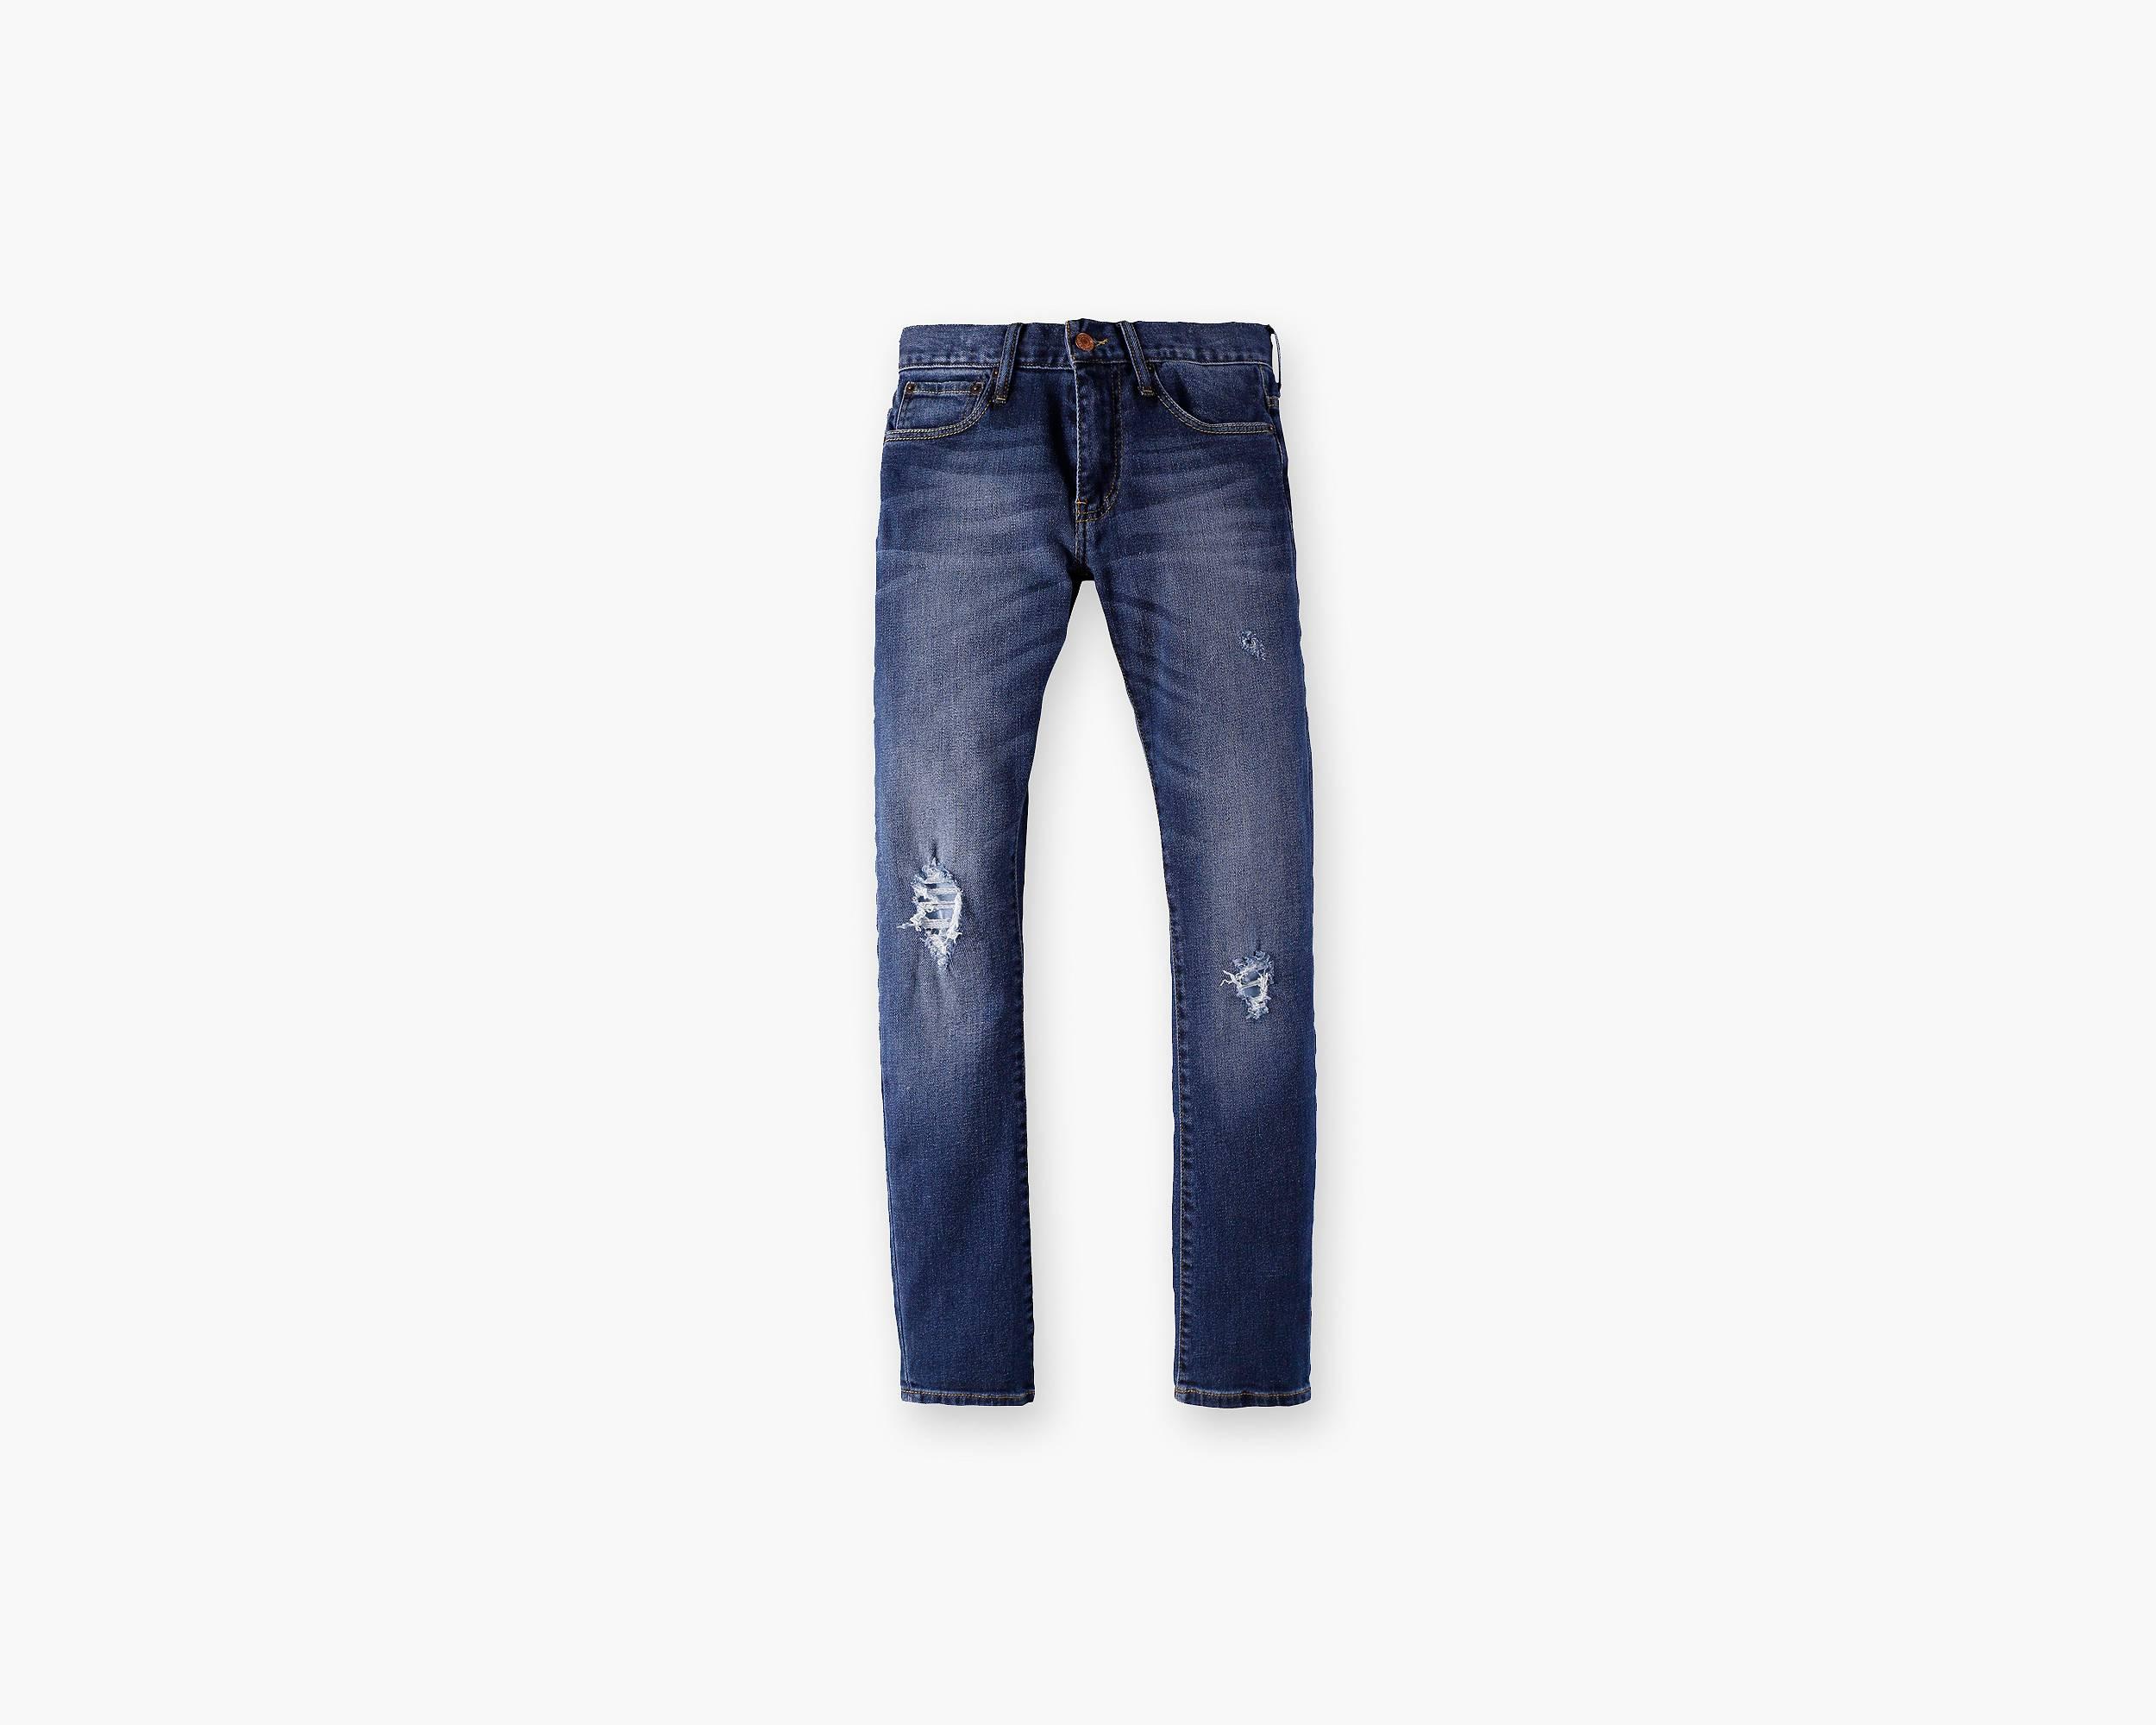 boys 520 extreme taper fit jeans denim levi 39 s great. Black Bedroom Furniture Sets. Home Design Ideas